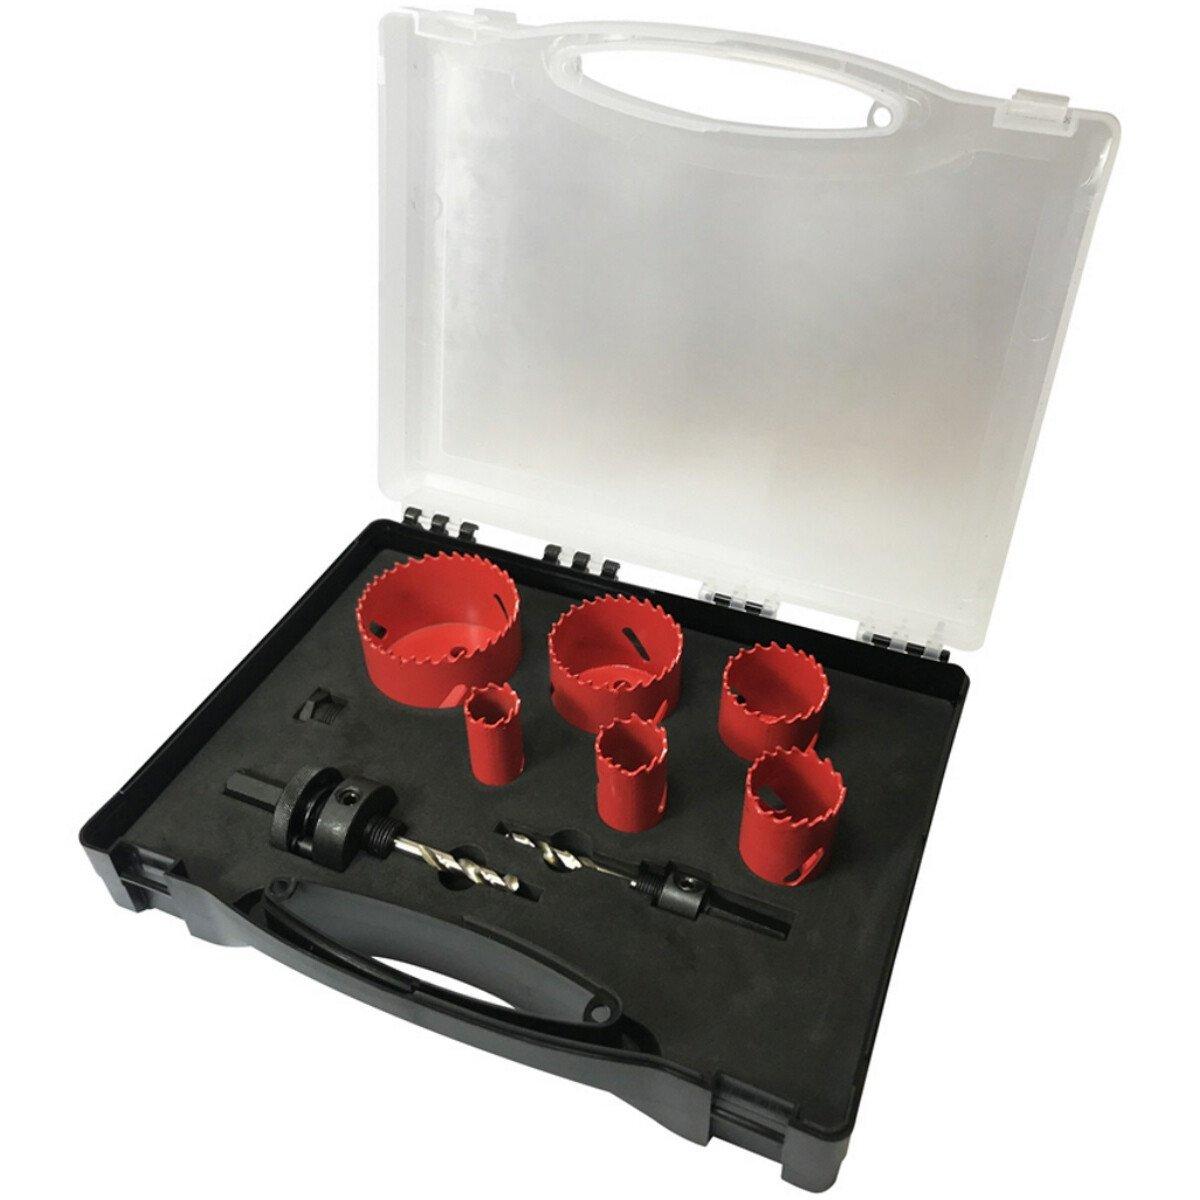 Spectre SP-17062 9 Piece Plumbers Holesaw Set